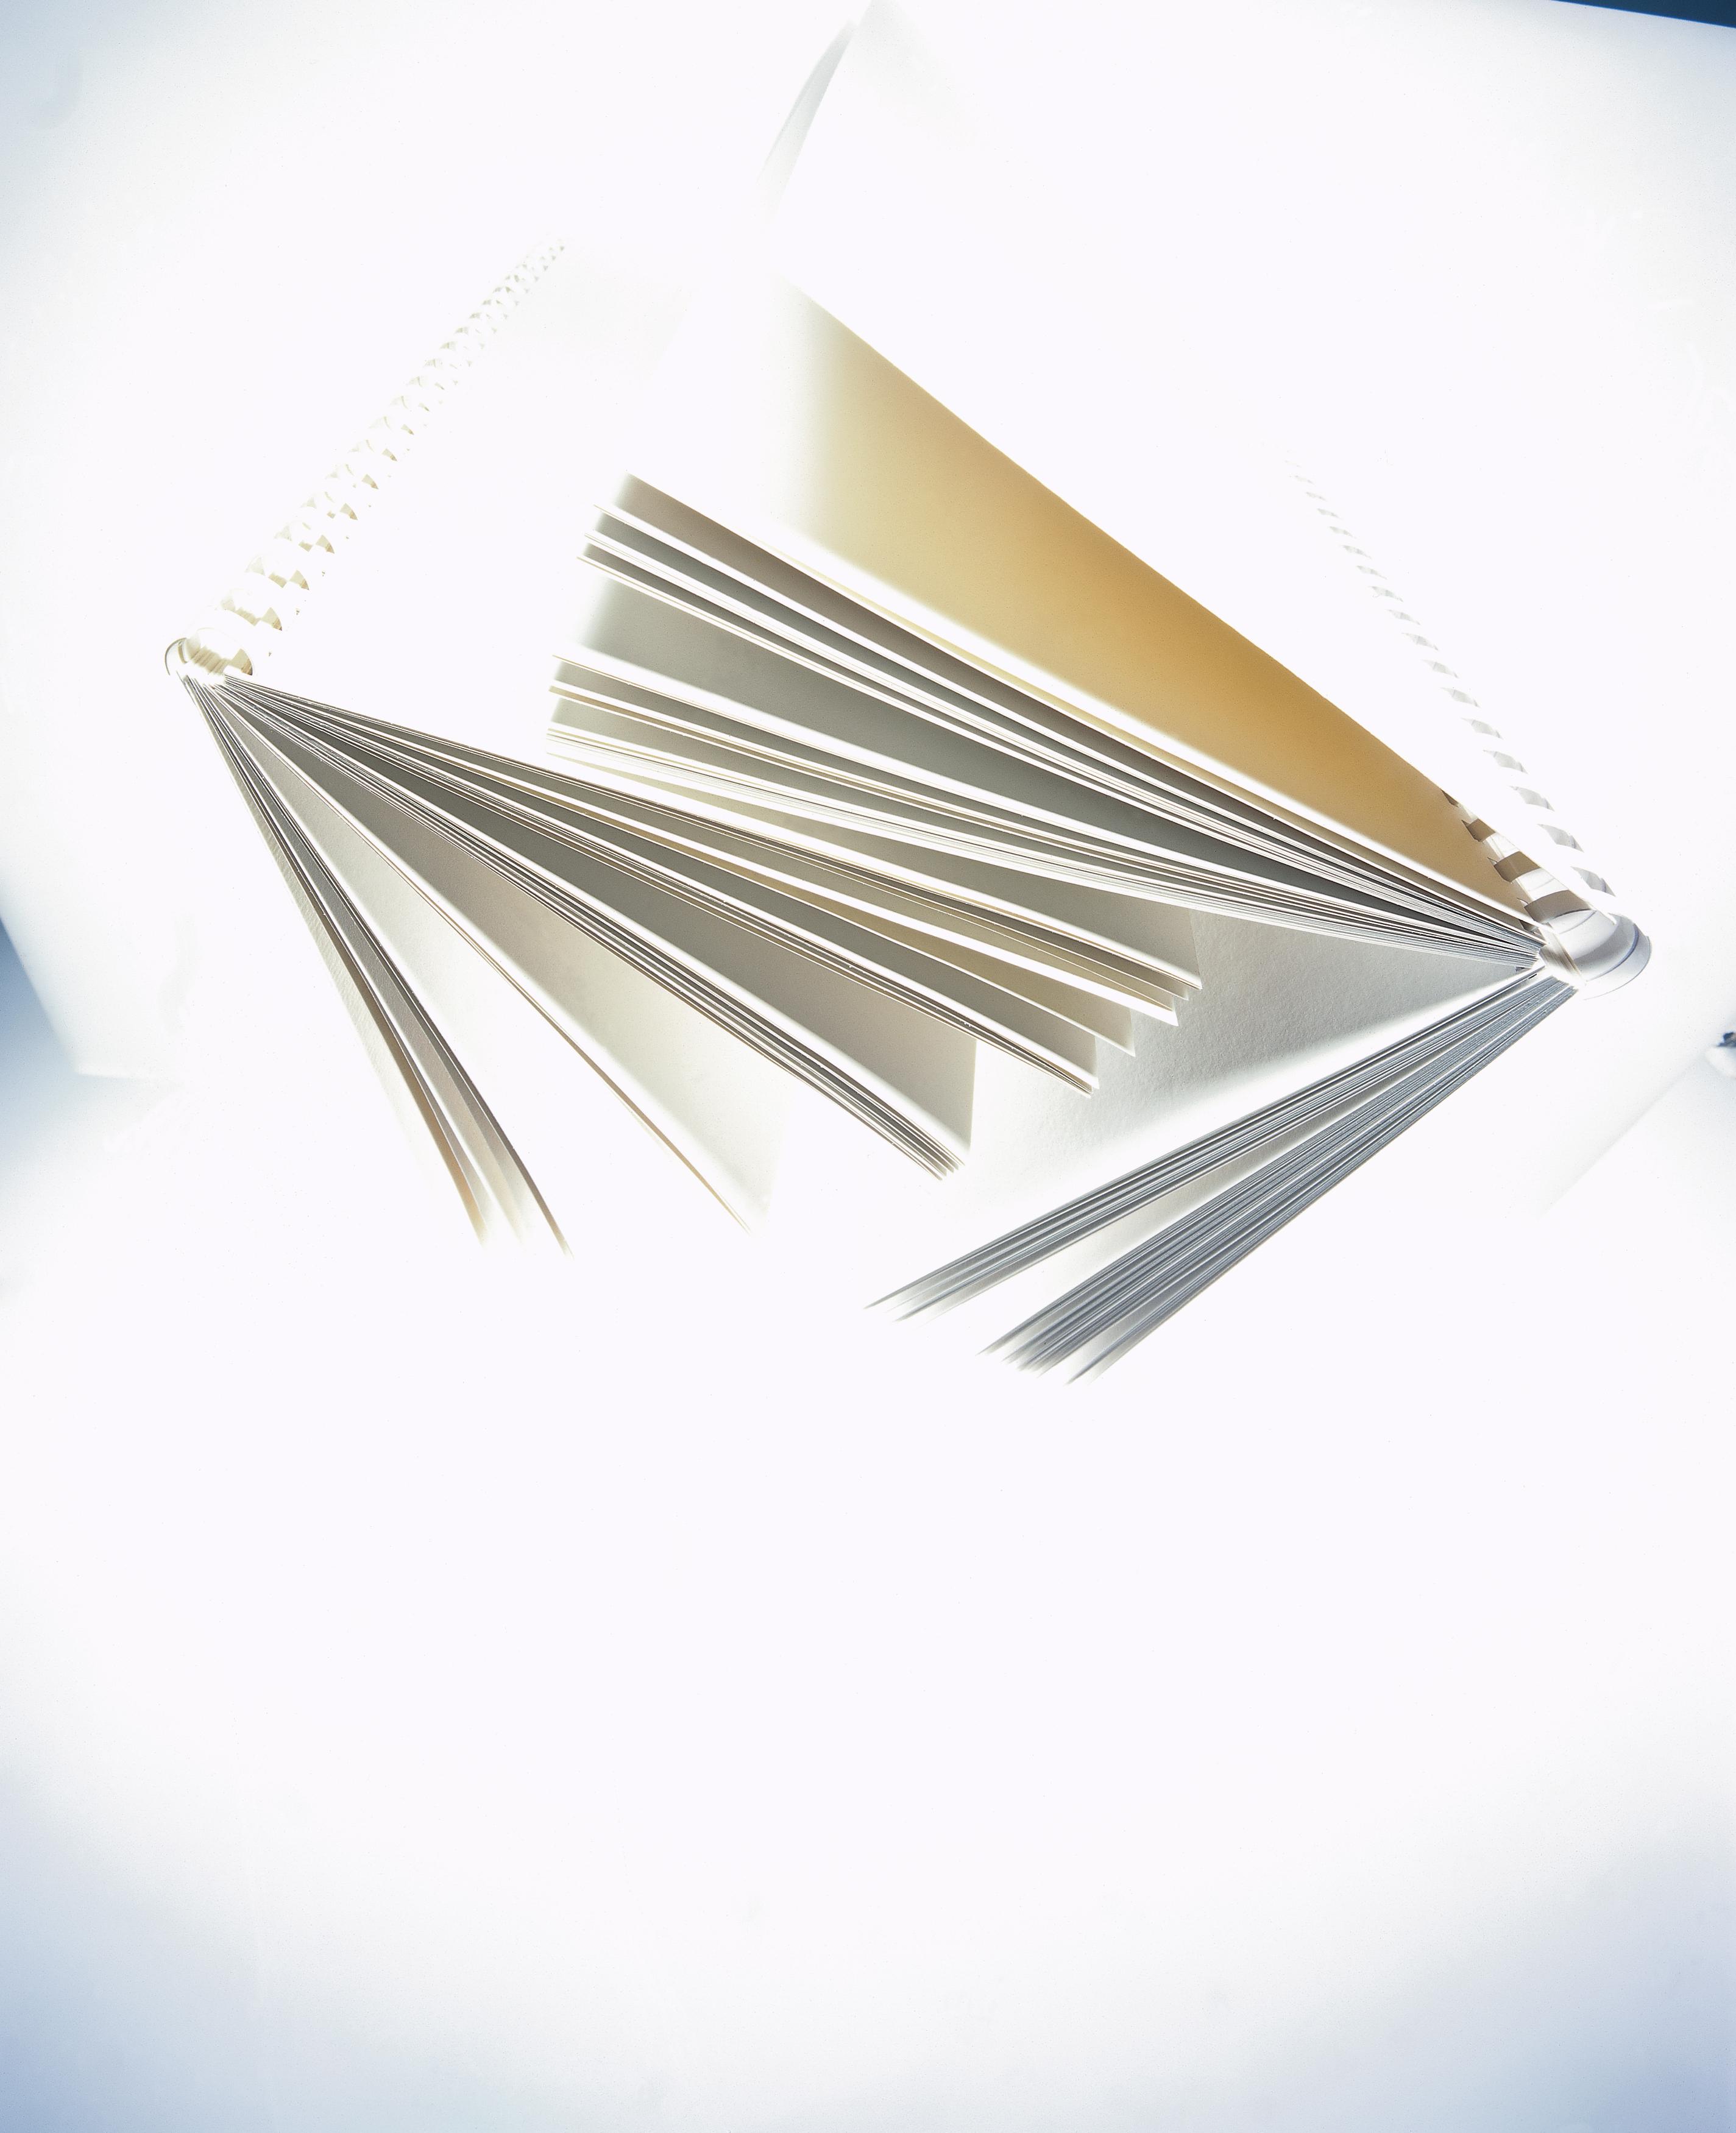 renz starter kit f r plastikbindung f r us teilung farbe blau kisling gmbh. Black Bedroom Furniture Sets. Home Design Ideas